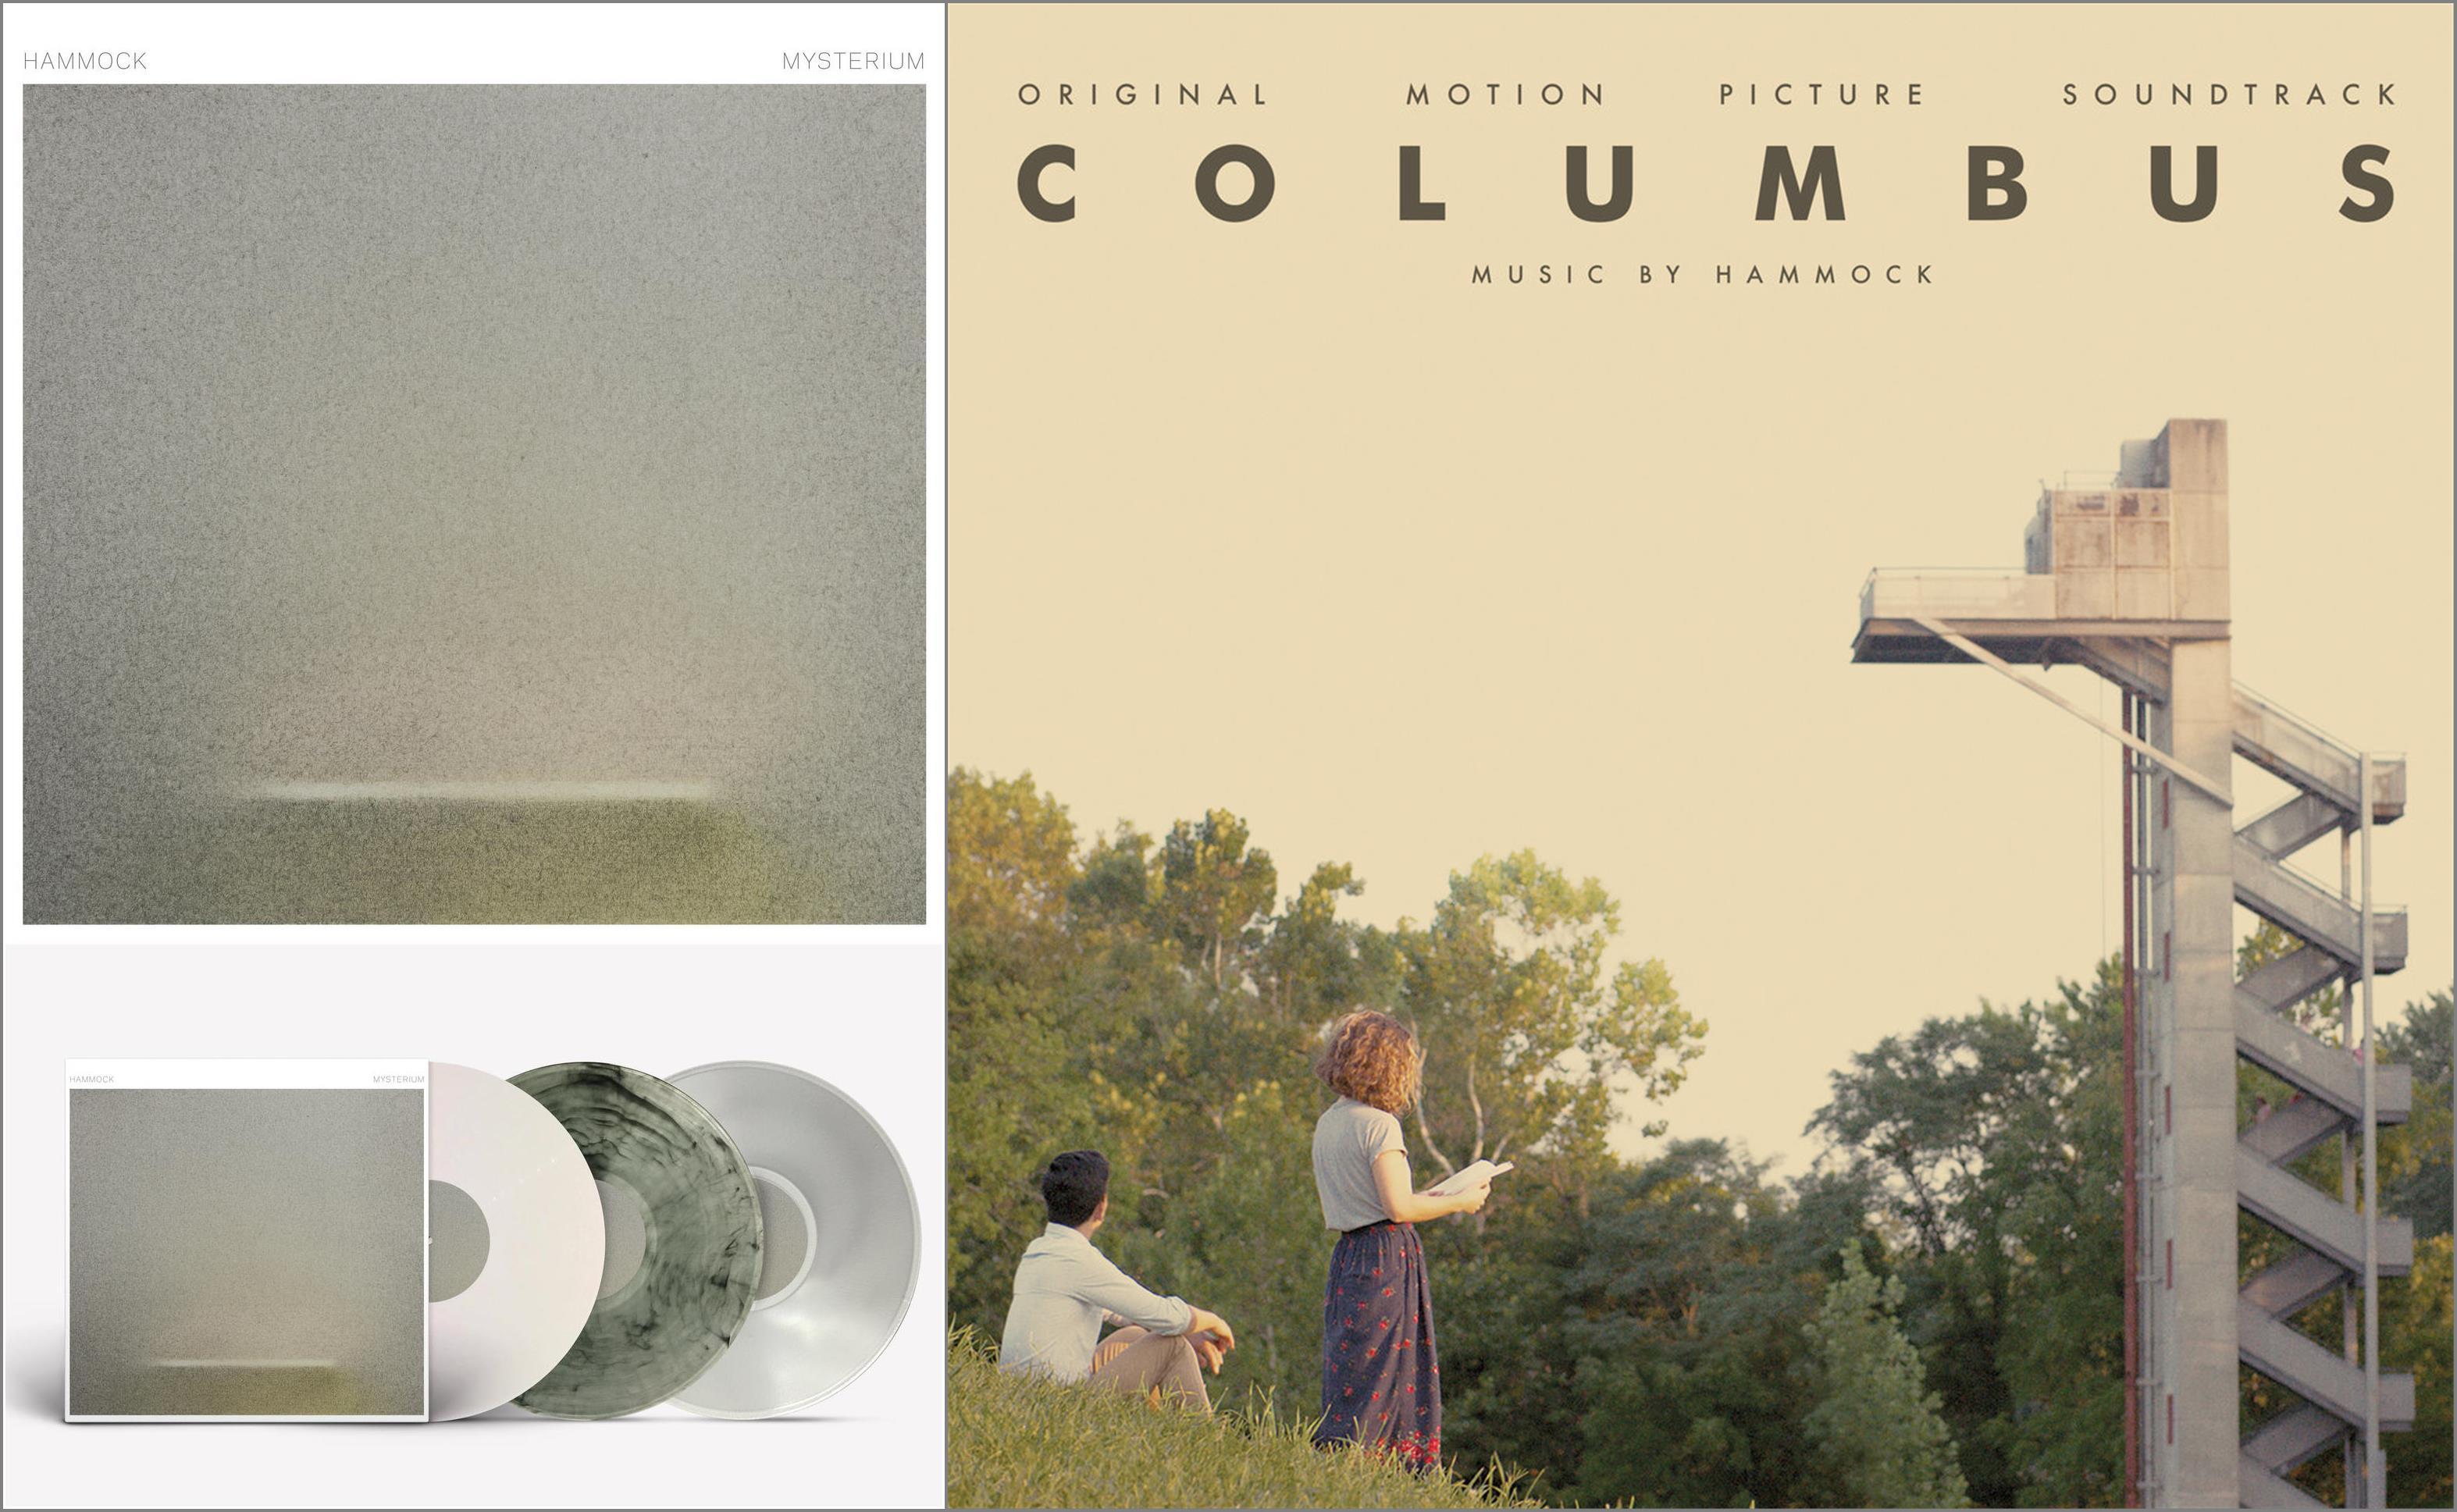 Hammock – Columbus (Original Motion Picture Soundtrack) / Mysterium